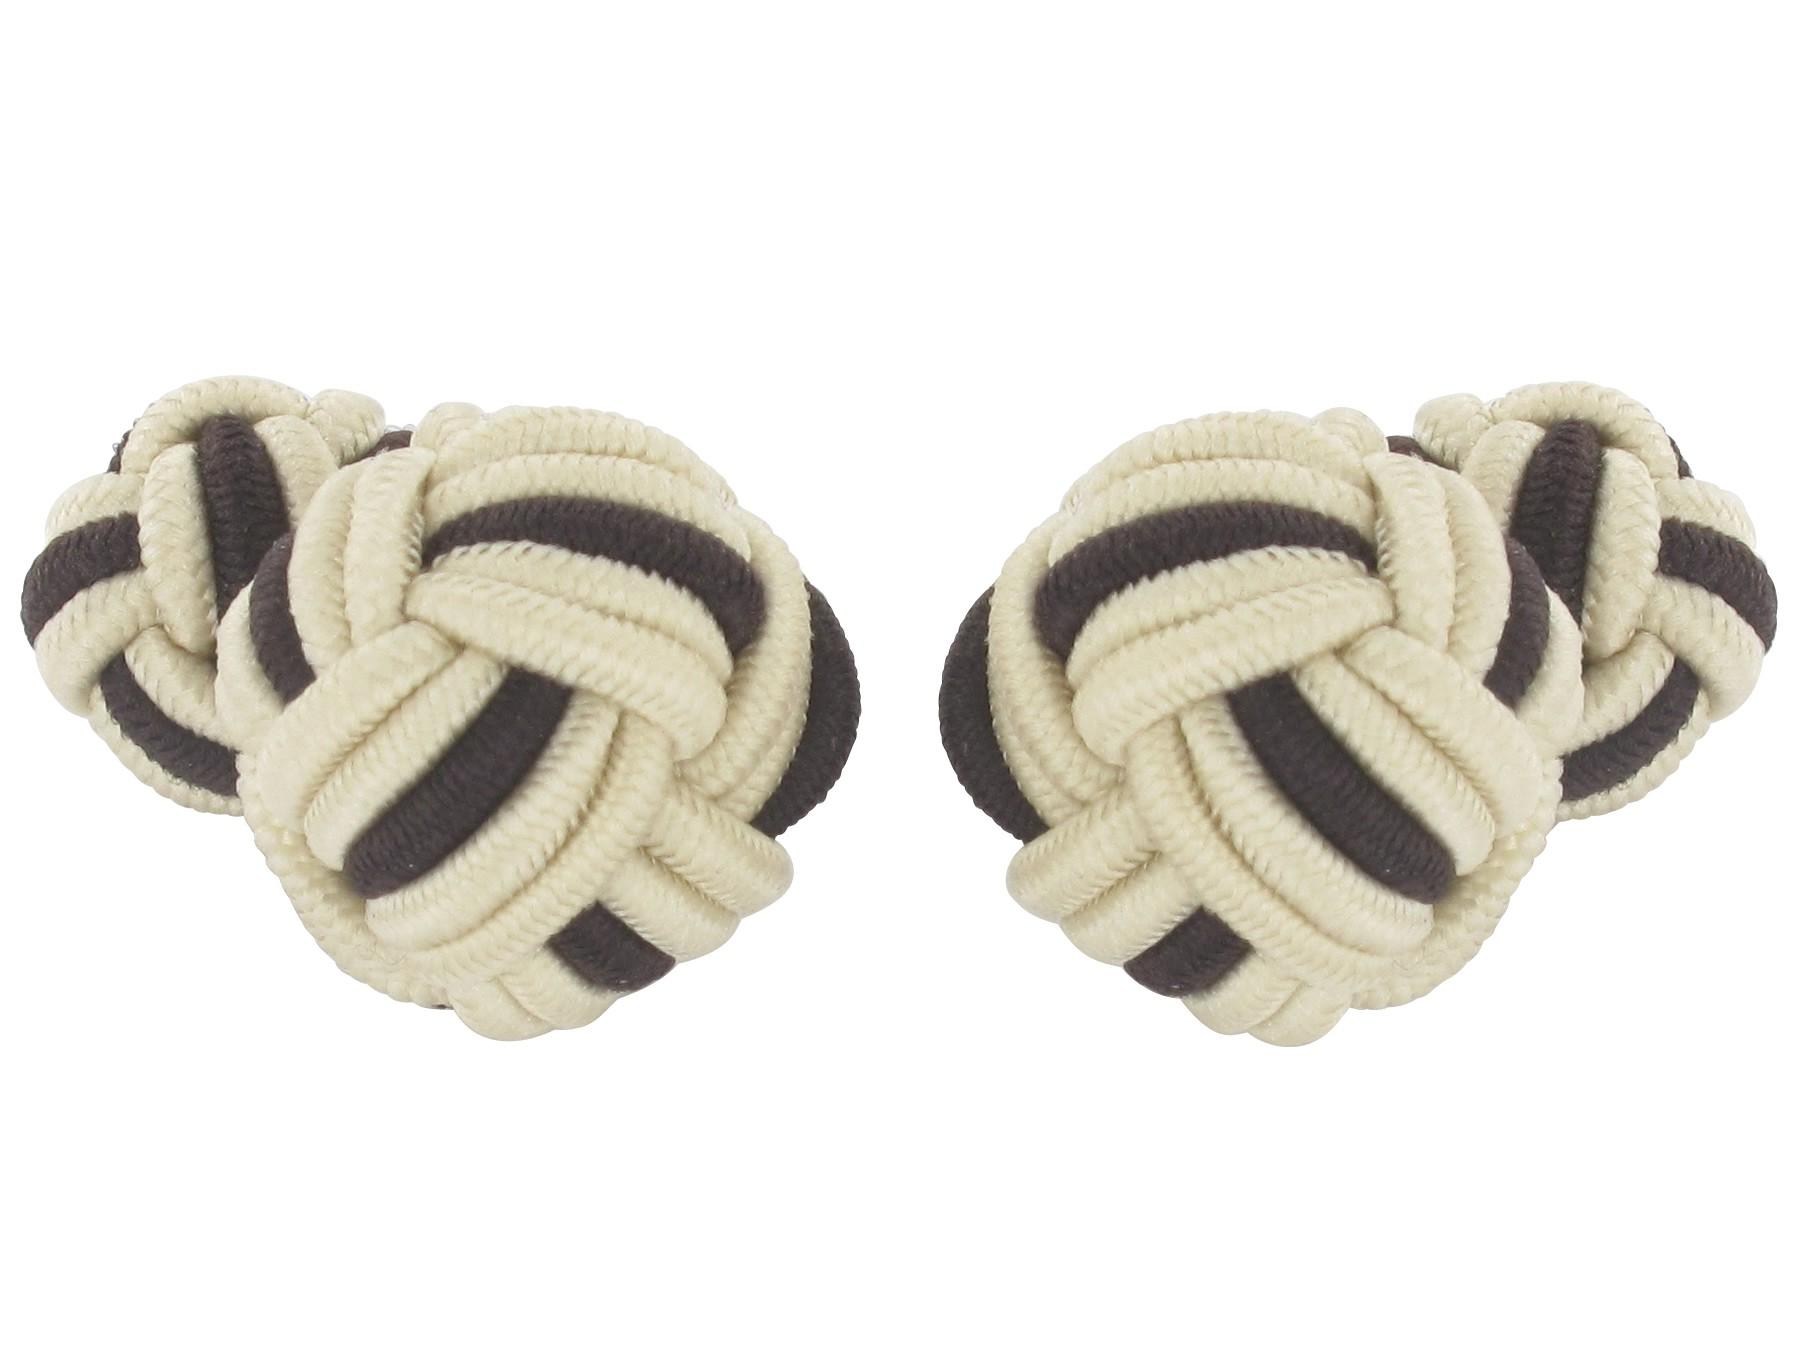 TEROON Manschettenknöpfe Seidenknoten beige-dunkelbraun